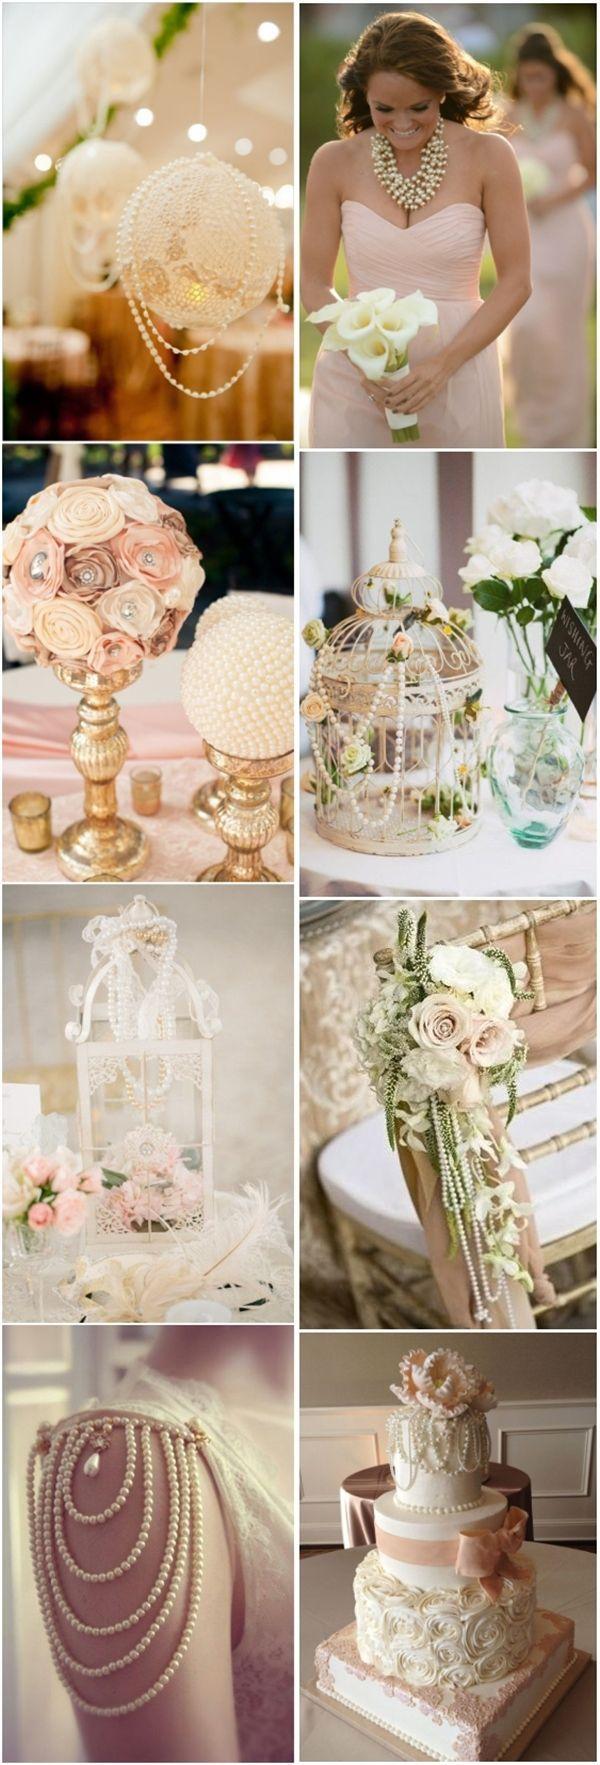 Best 25 vintage weddings decorations ideas on pinterest - Decoracion vintage retro ...